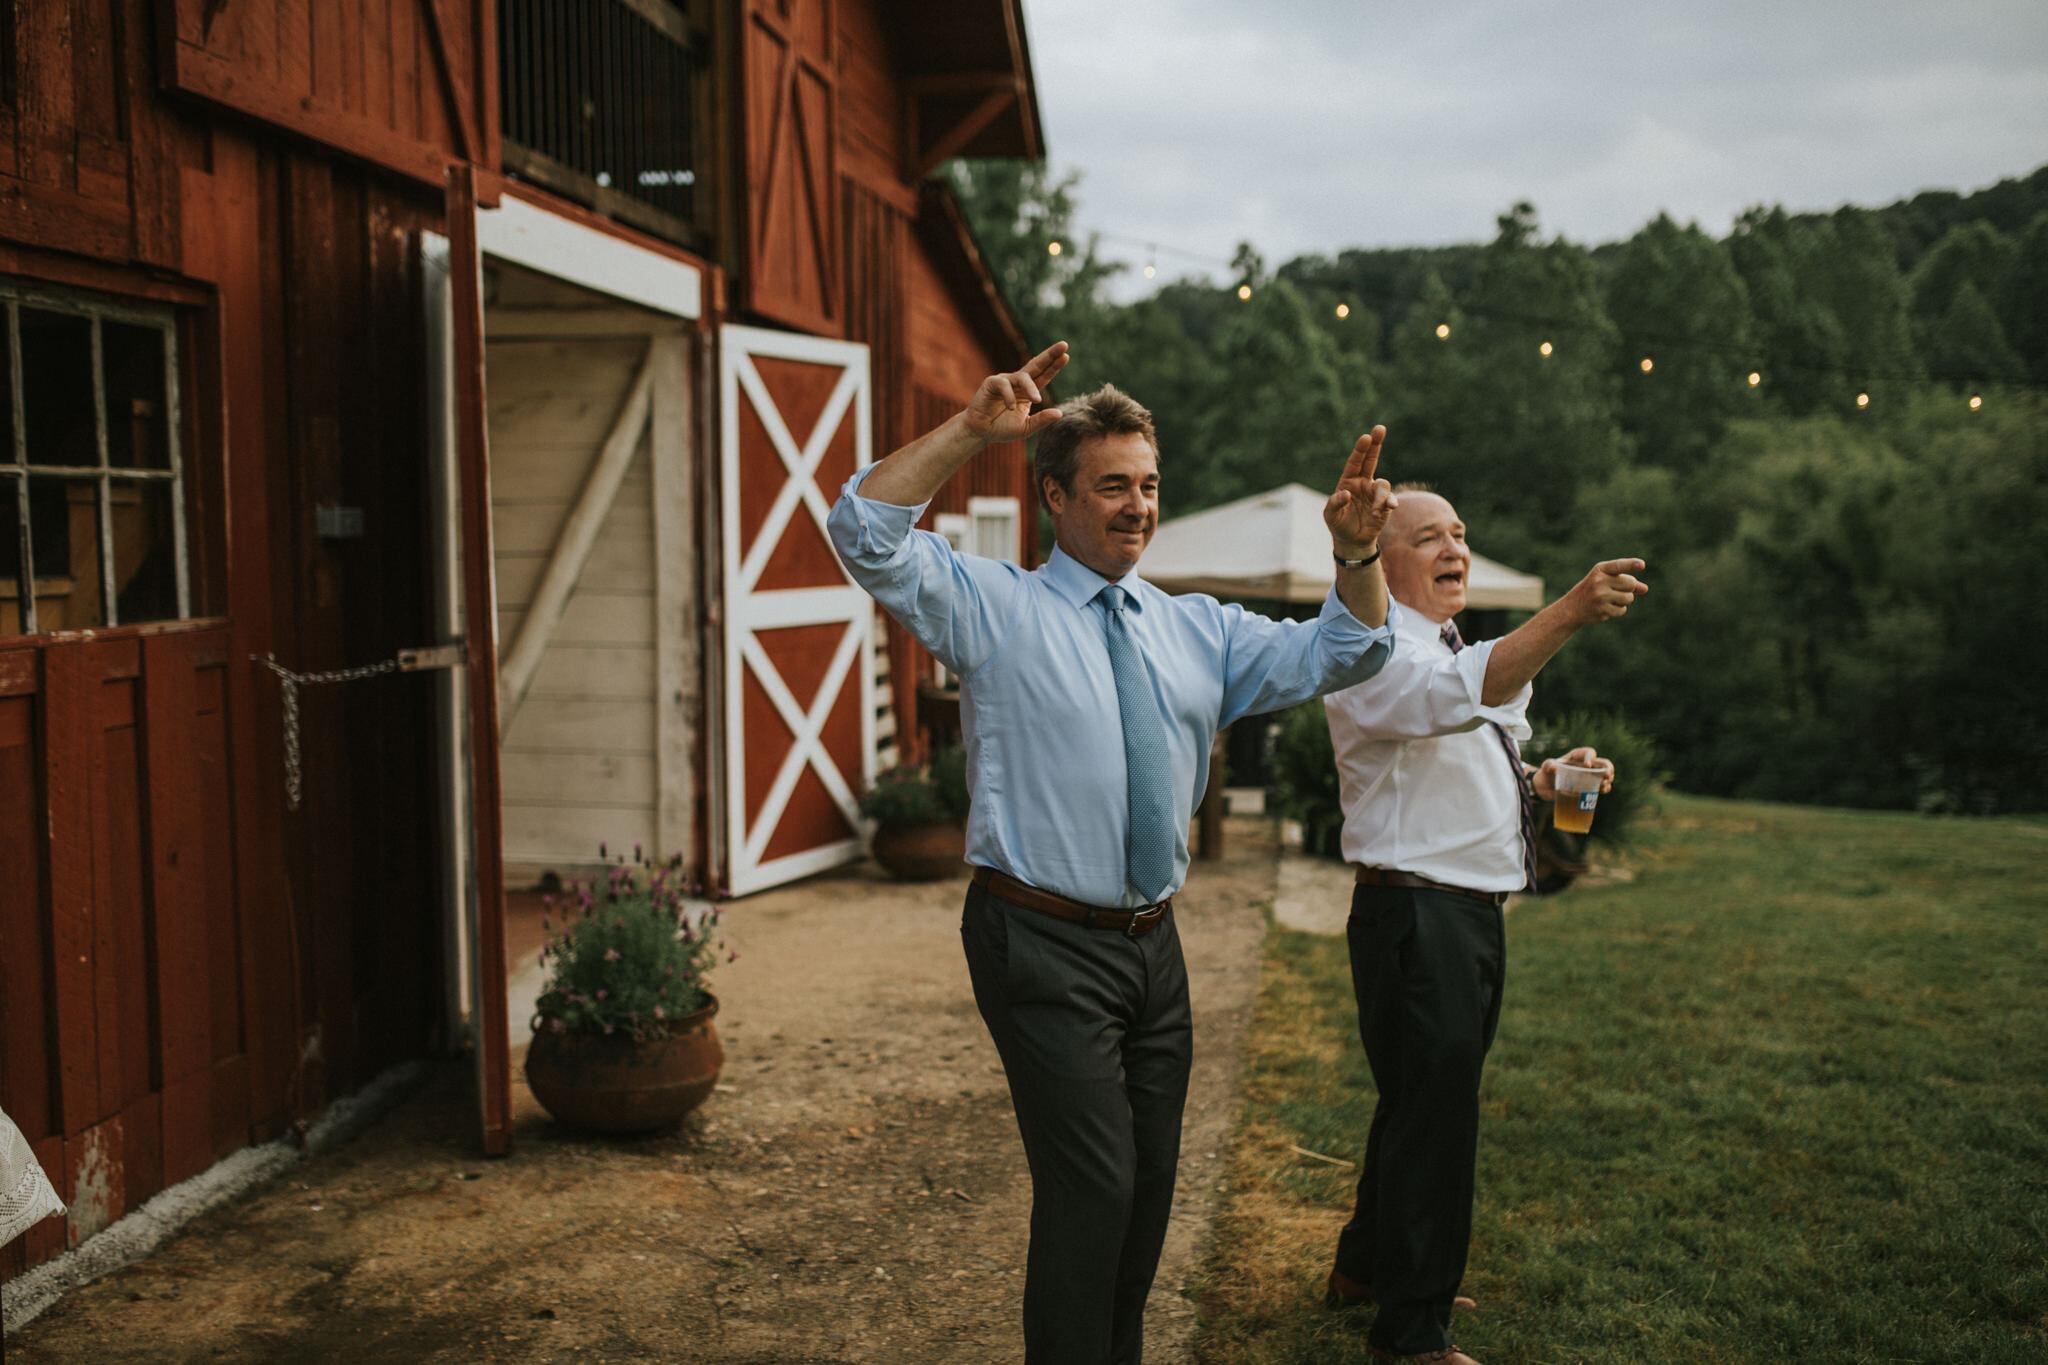 KateMatt-North-Georgia-Wedding-Photographer-Mountain-Laurel-Farm-149.jpg